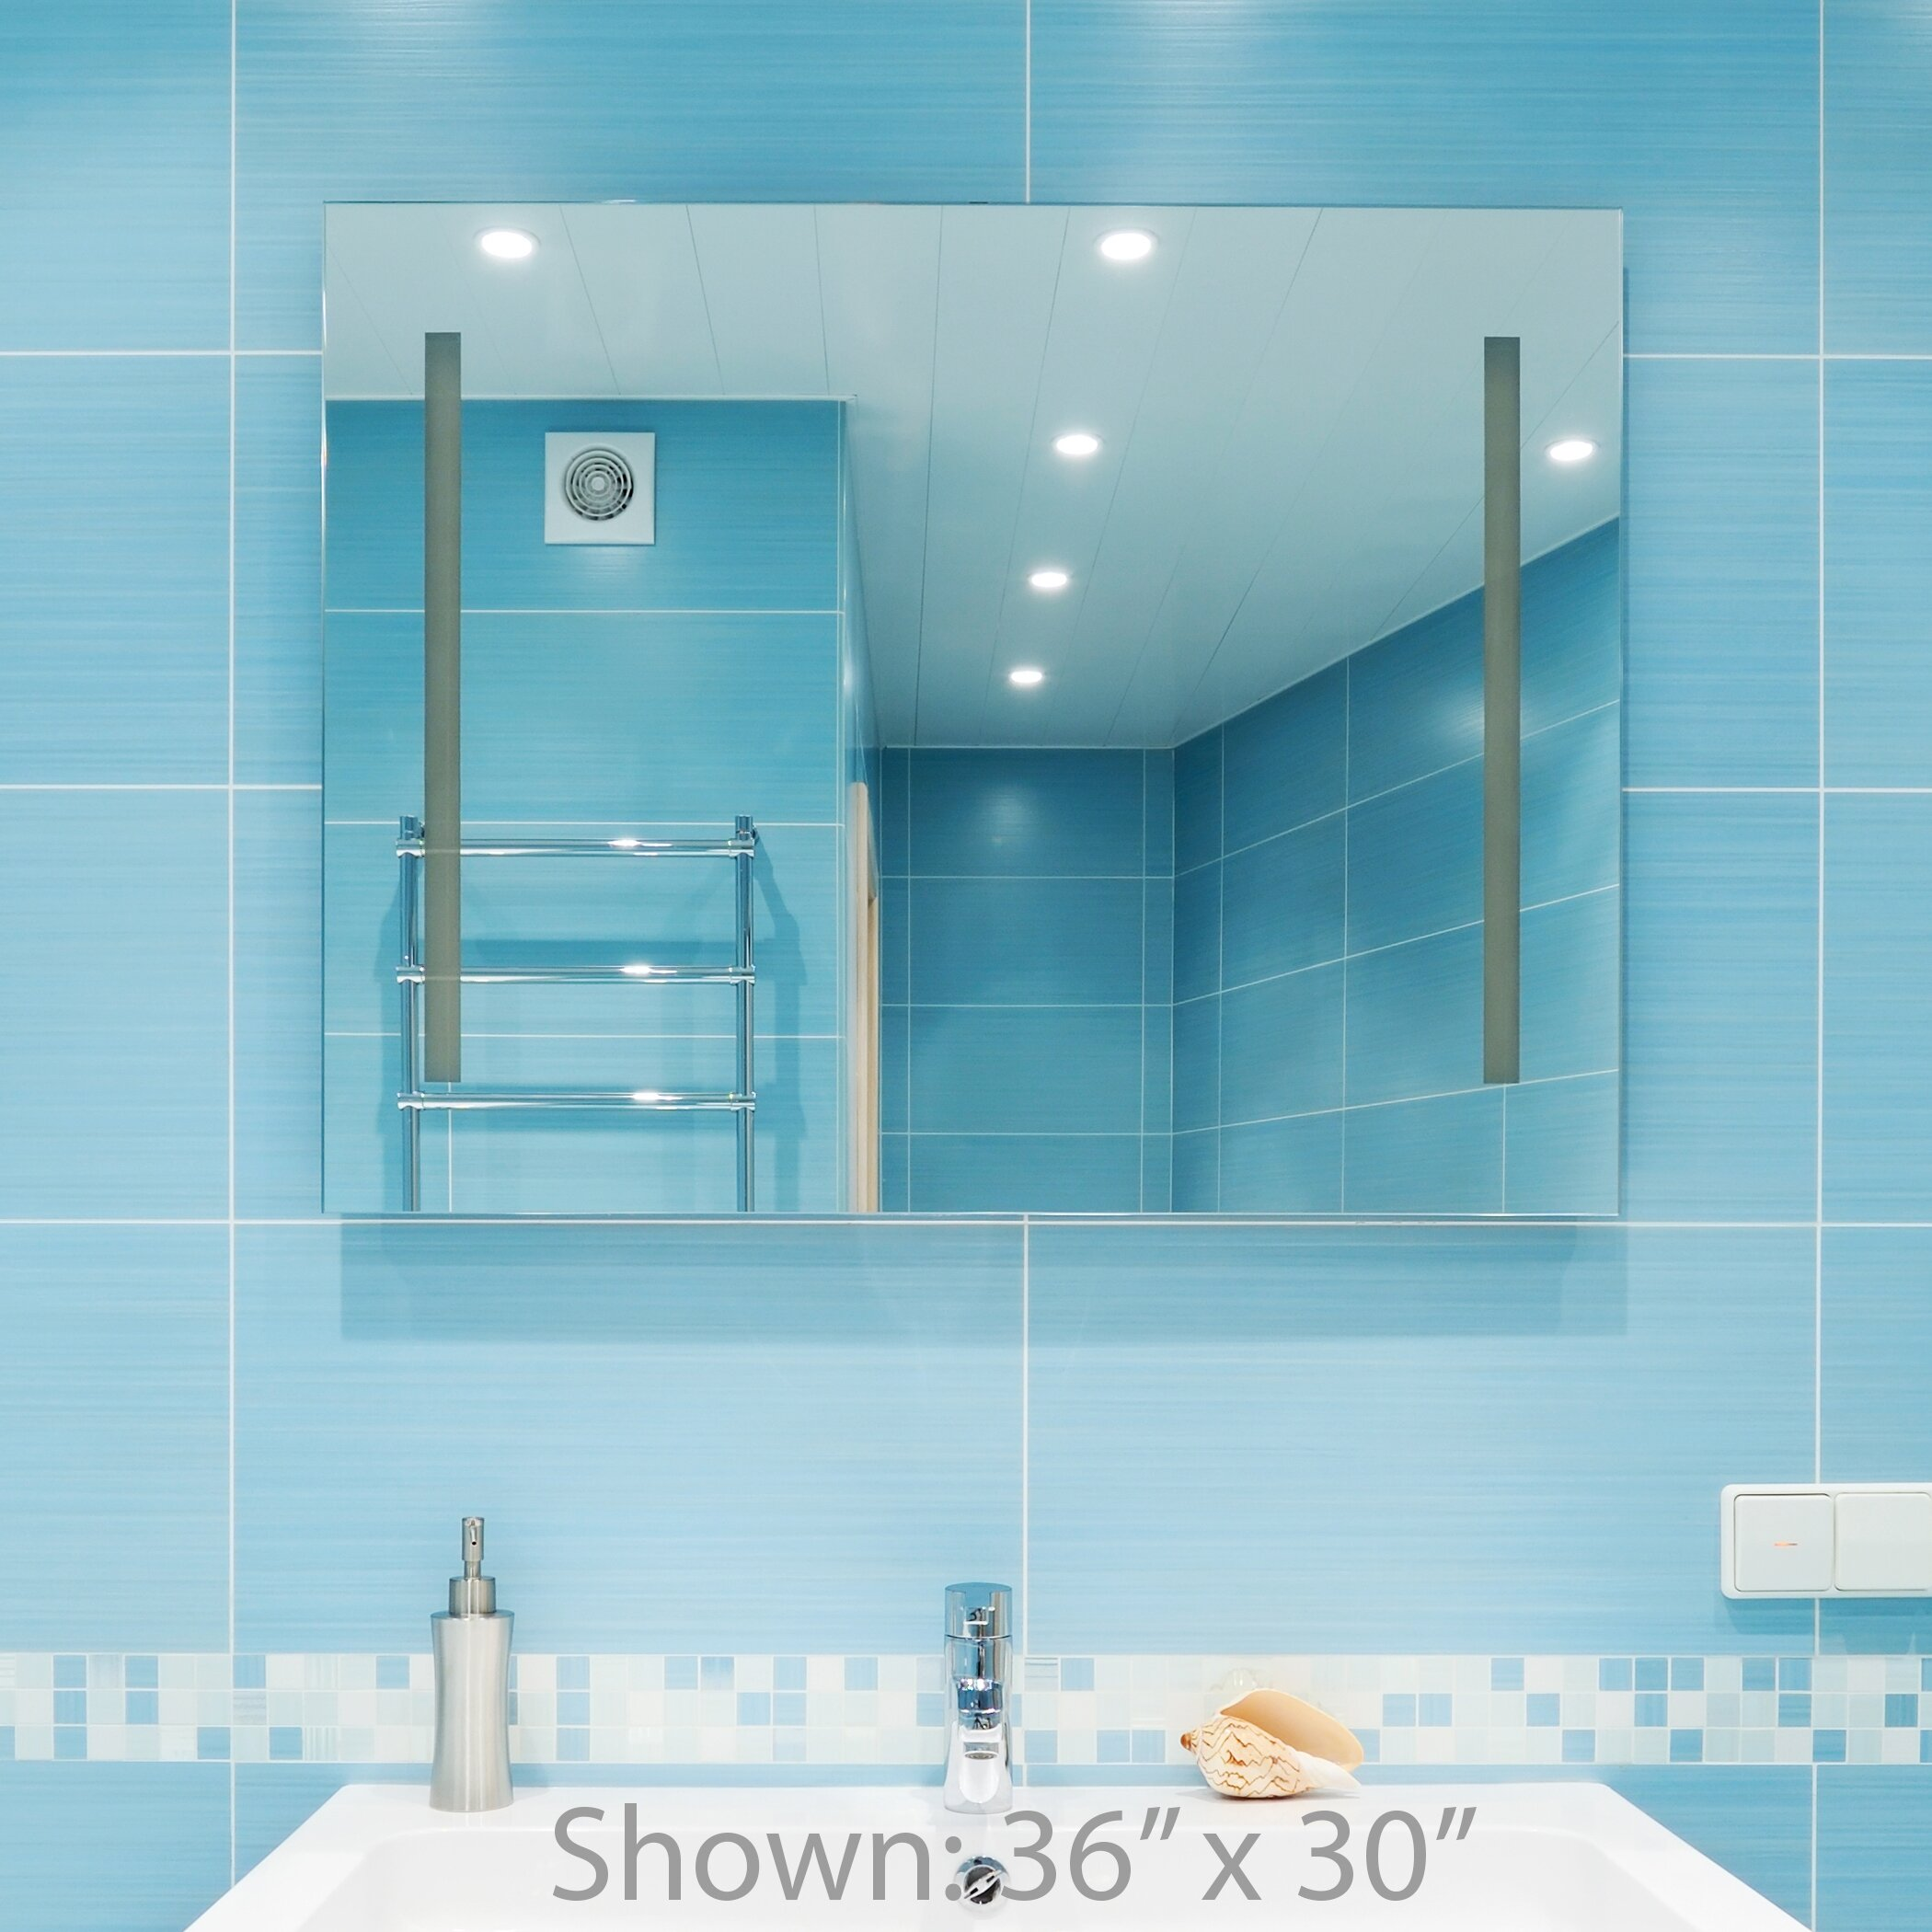 Bathroom Lifts Sylve. Bathroom Aids For Disabled   Sylve net